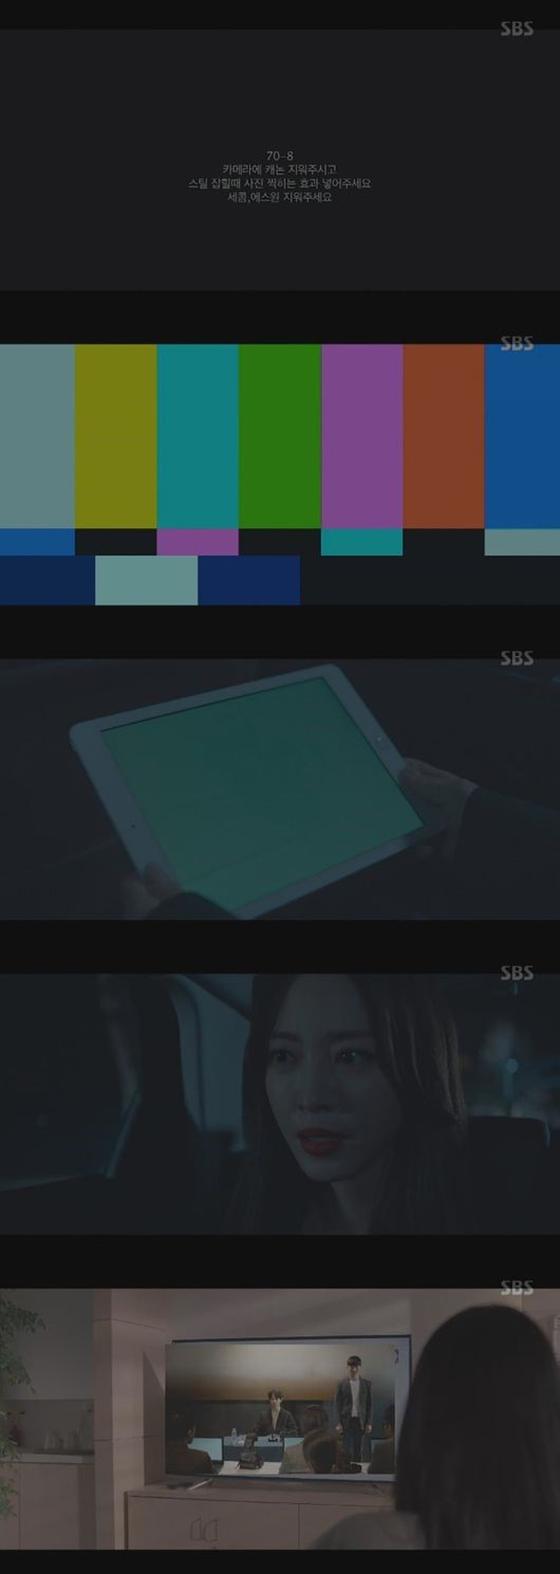 SBS 드라마 '빅이슈'의 방송사고 장면